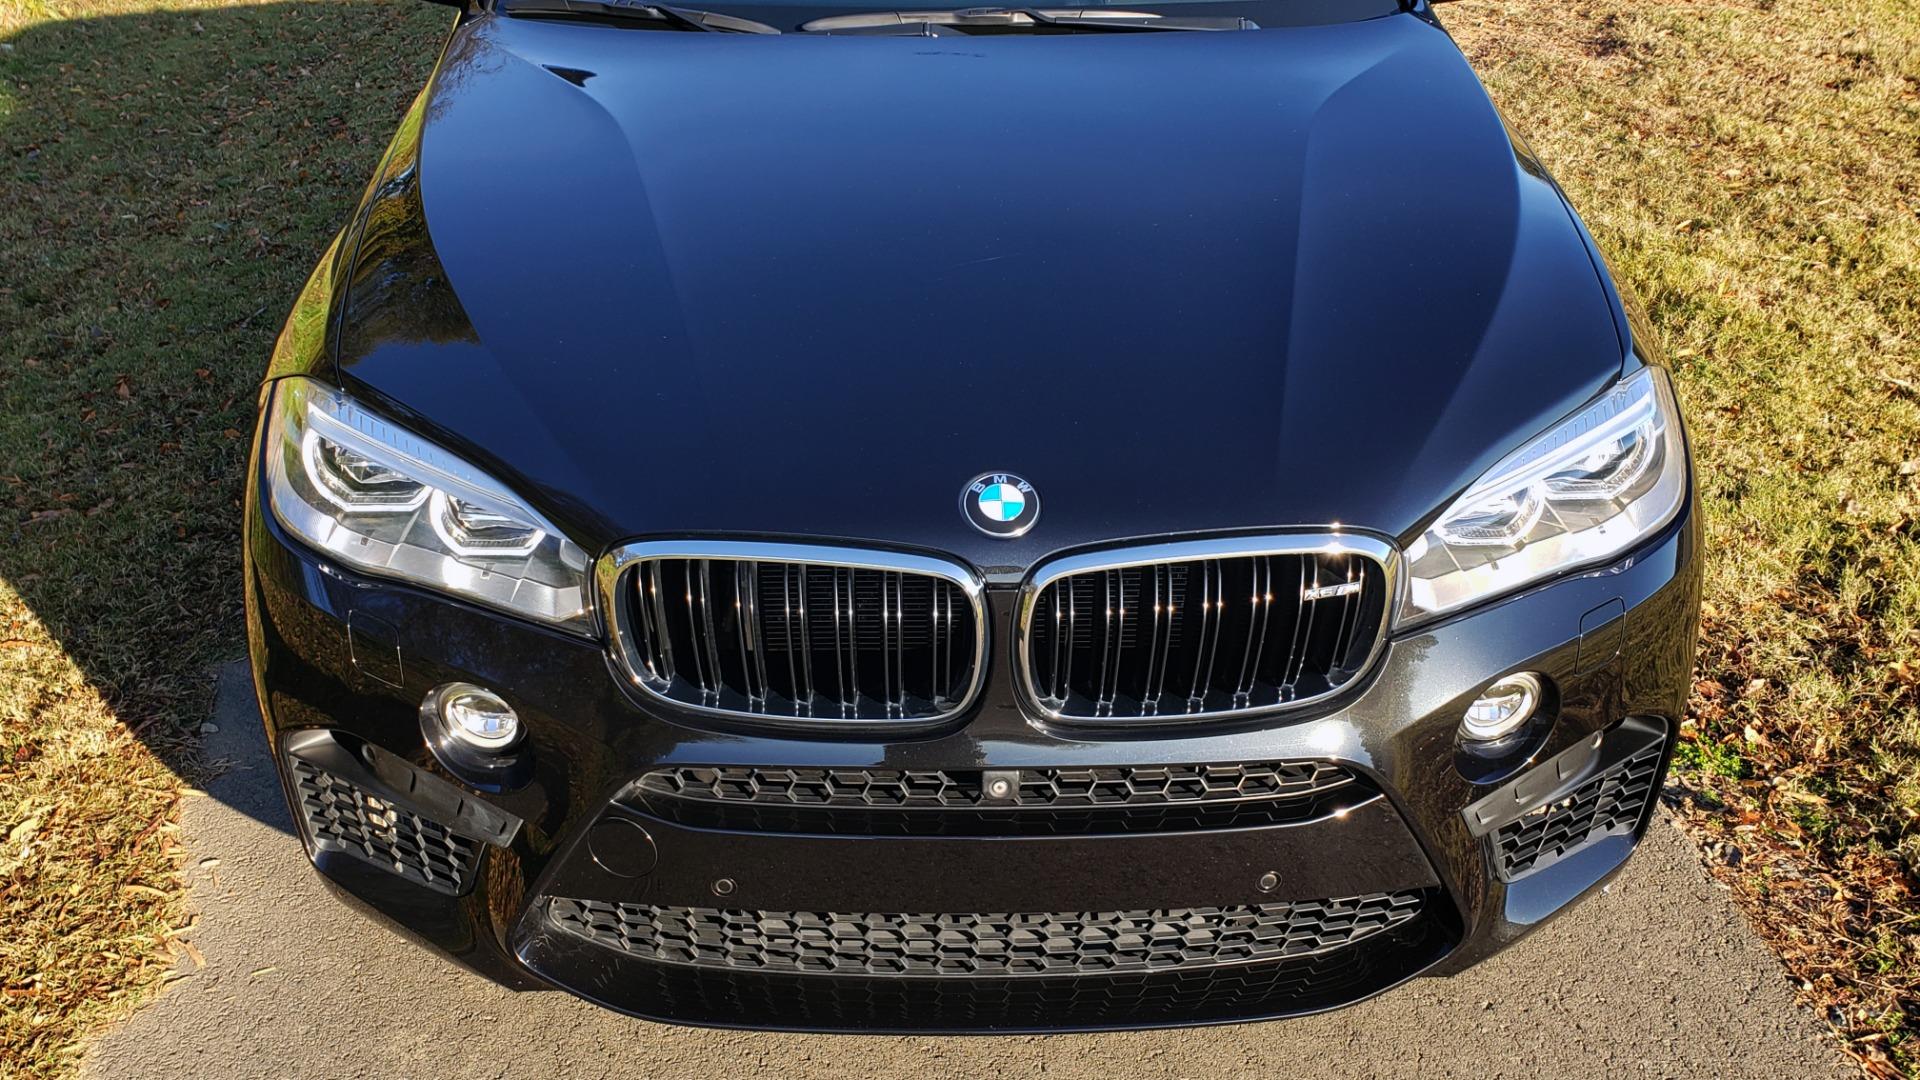 Used 2016 BMW X6 M EXEC PKG / DRVR ASST / NAV / SUNROOF / BLIND SPOT / REARVIEW for sale Sold at Formula Imports in Charlotte NC 28227 12